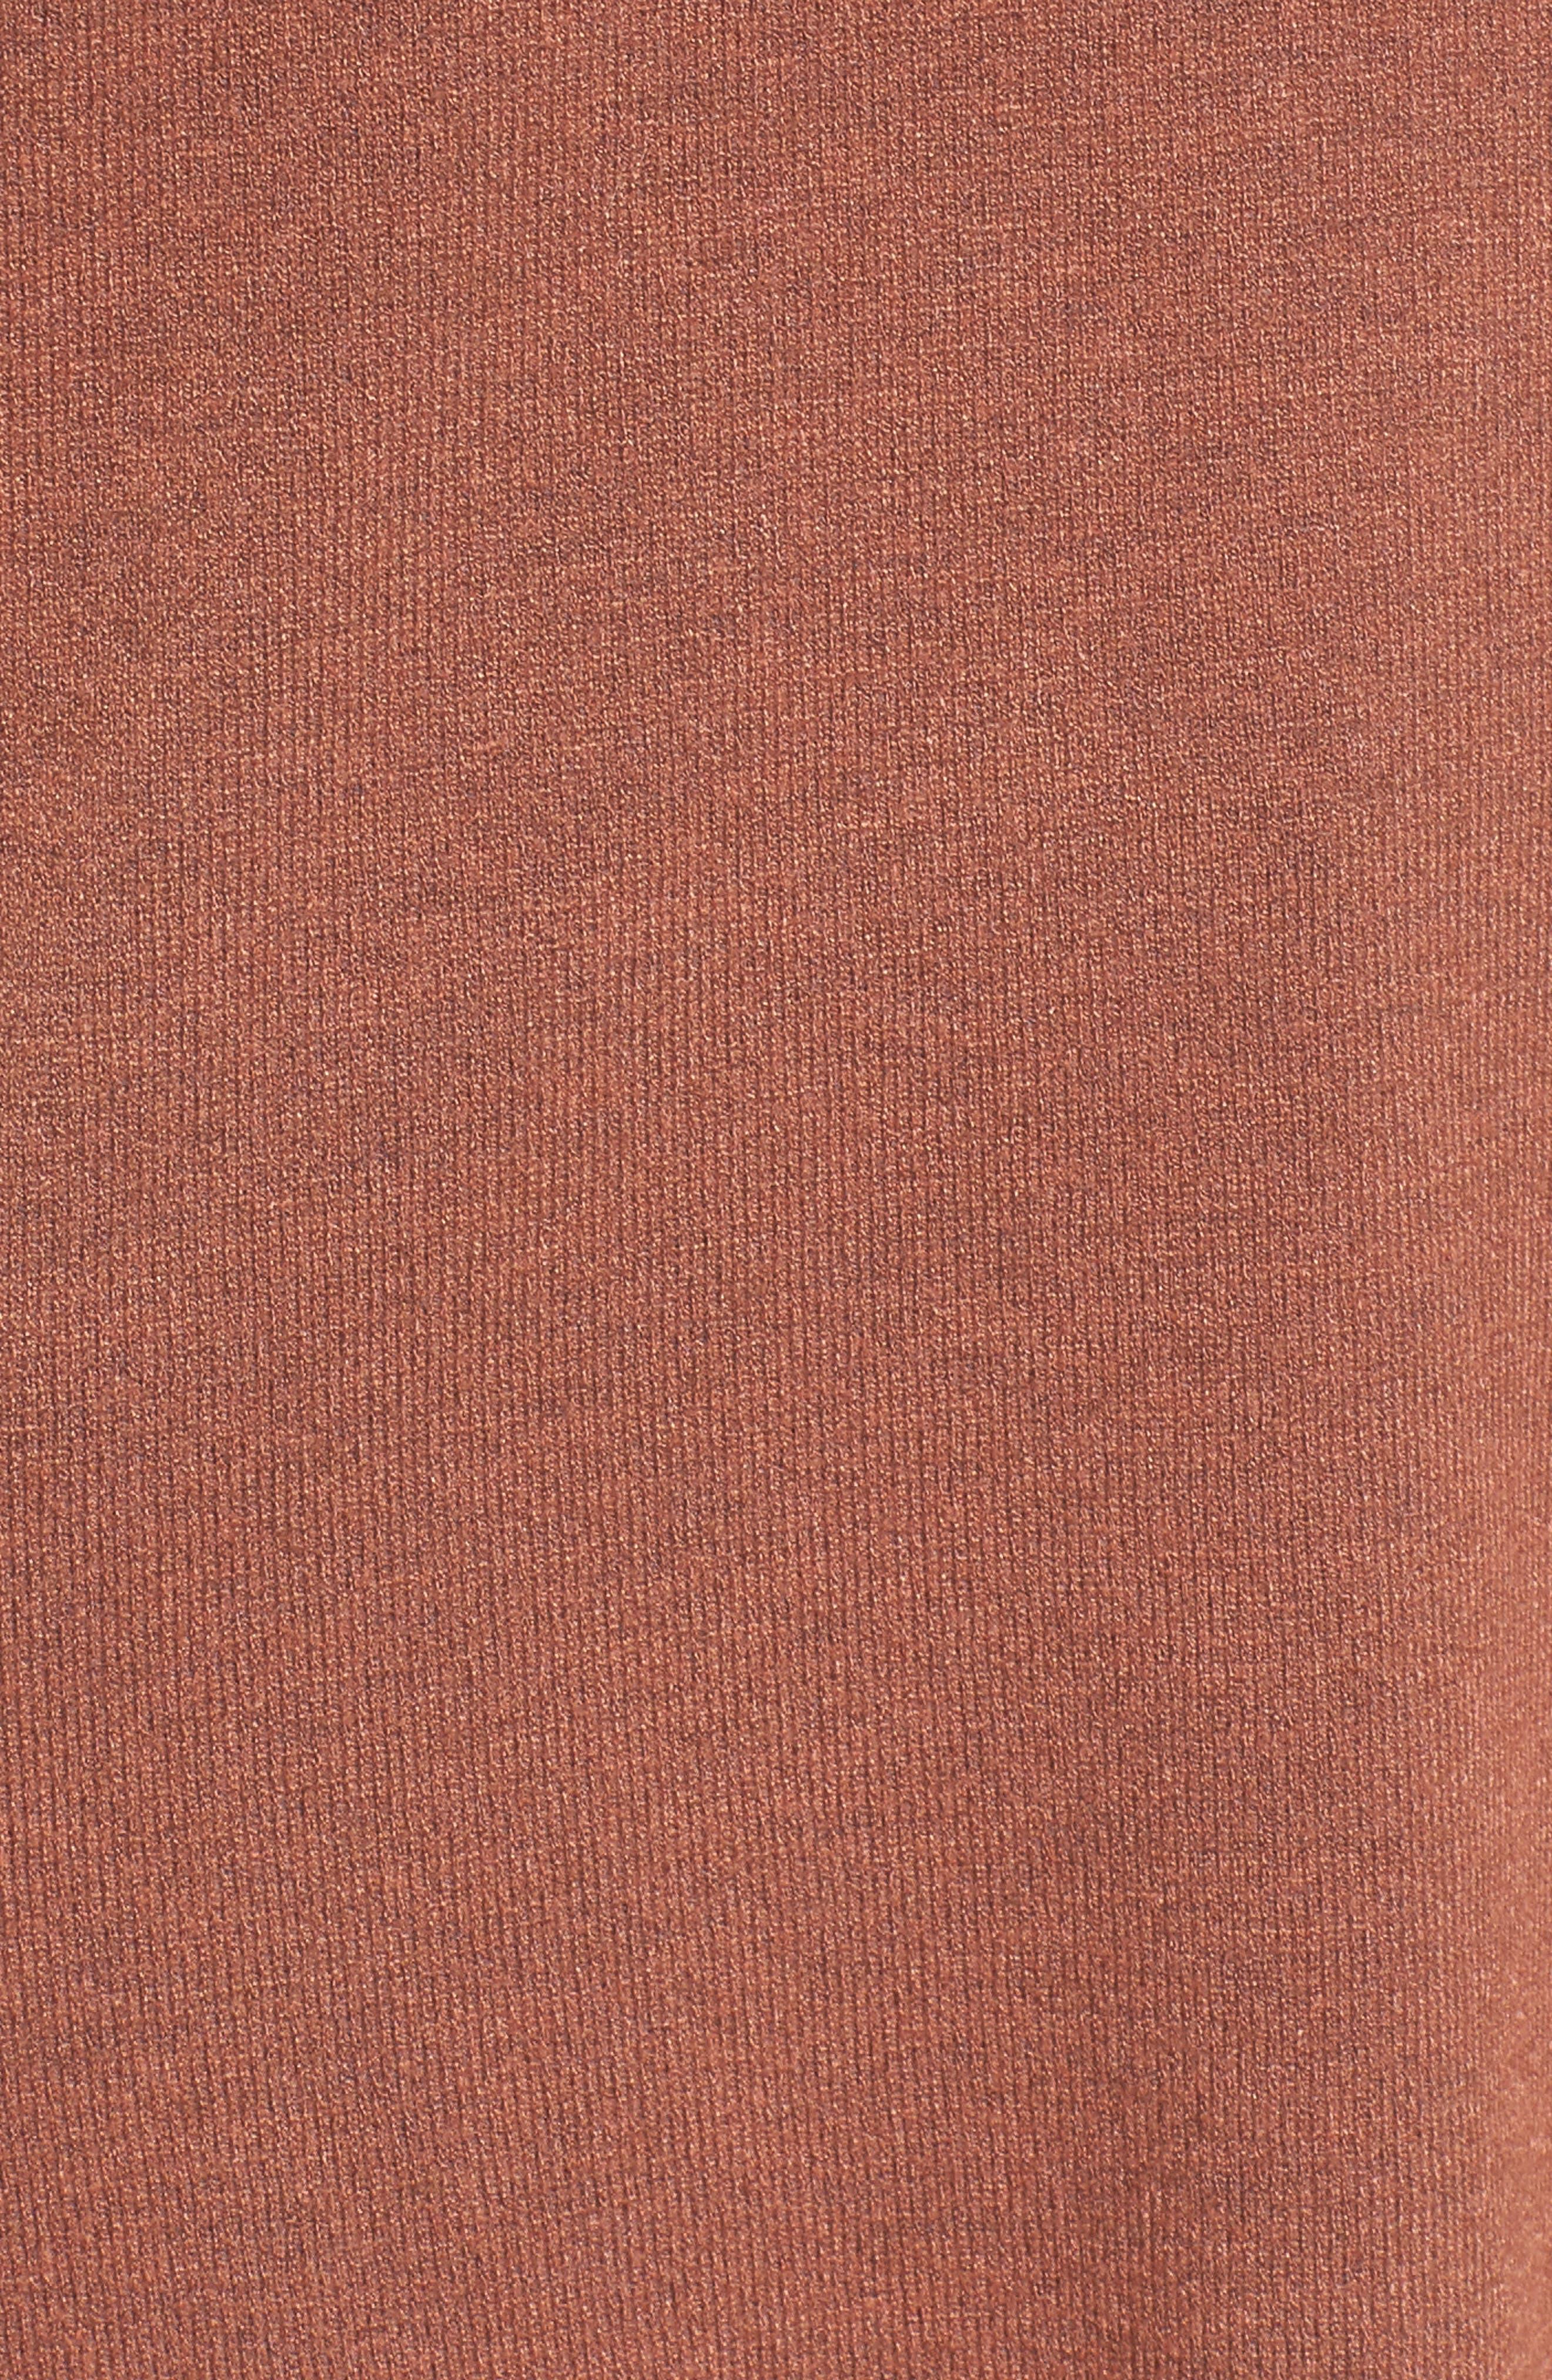 Laced Up V-Back Sweater,                             Alternate thumbnail 5, color,                             Ginger